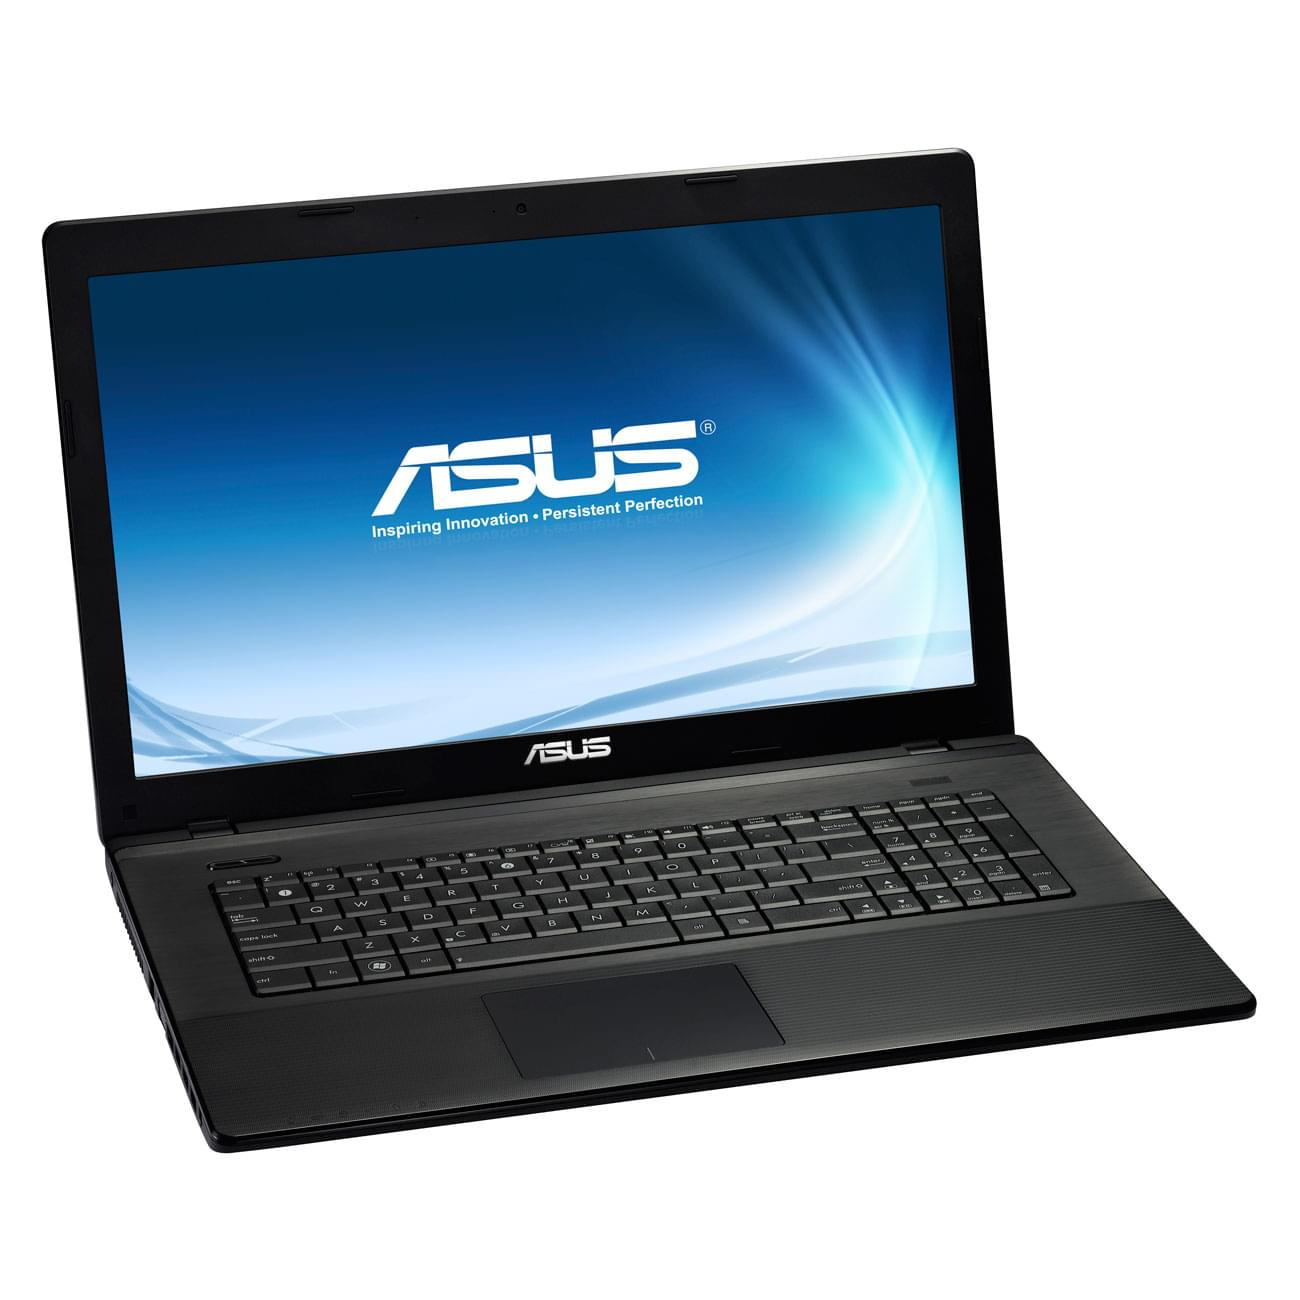 Asus X75VD-TY074V - PC portable Asus - Cybertek.fr - 0